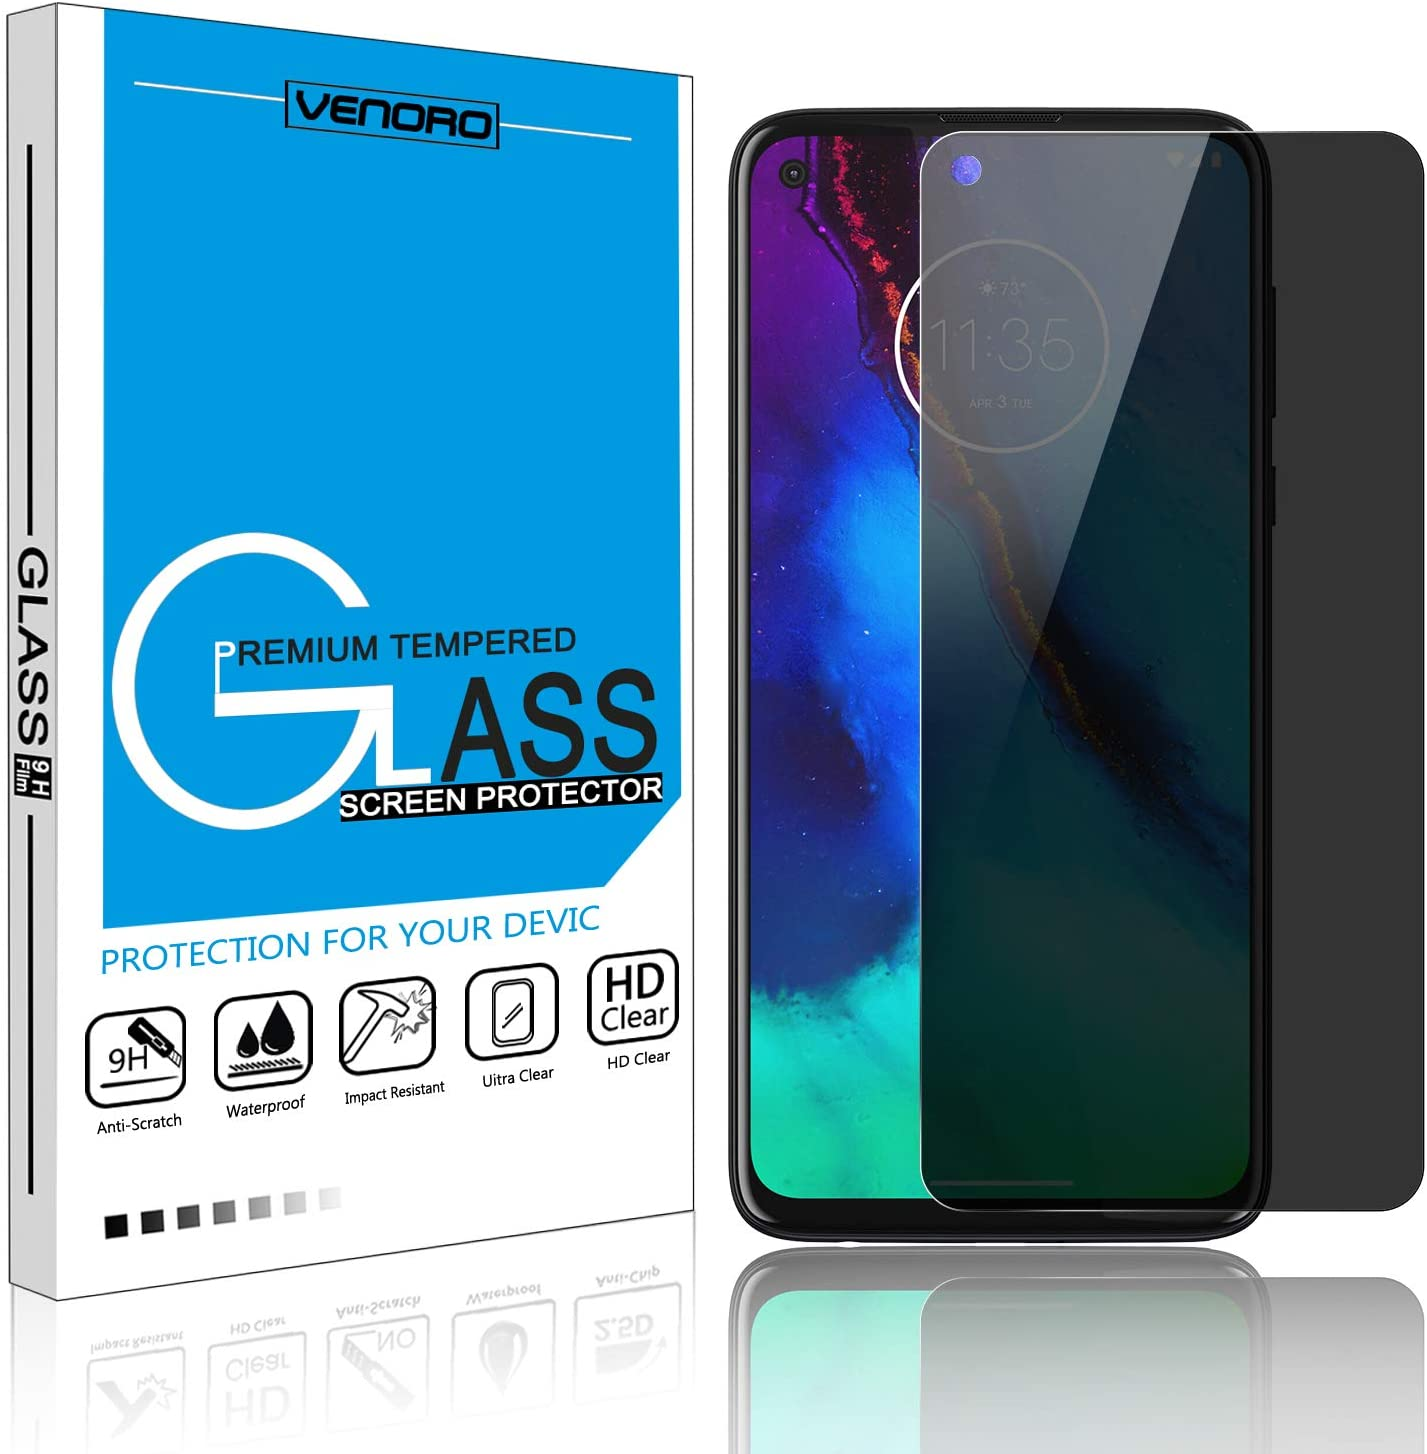 [1 Pack] Moto G Stylus Screen Protector, Venoro 9H Anti-Scratch Bubble Free Privacy Anti-Spy Full Screen Tempered Glass Screen Protector for Motorola Moto G Stylus 6.4inch